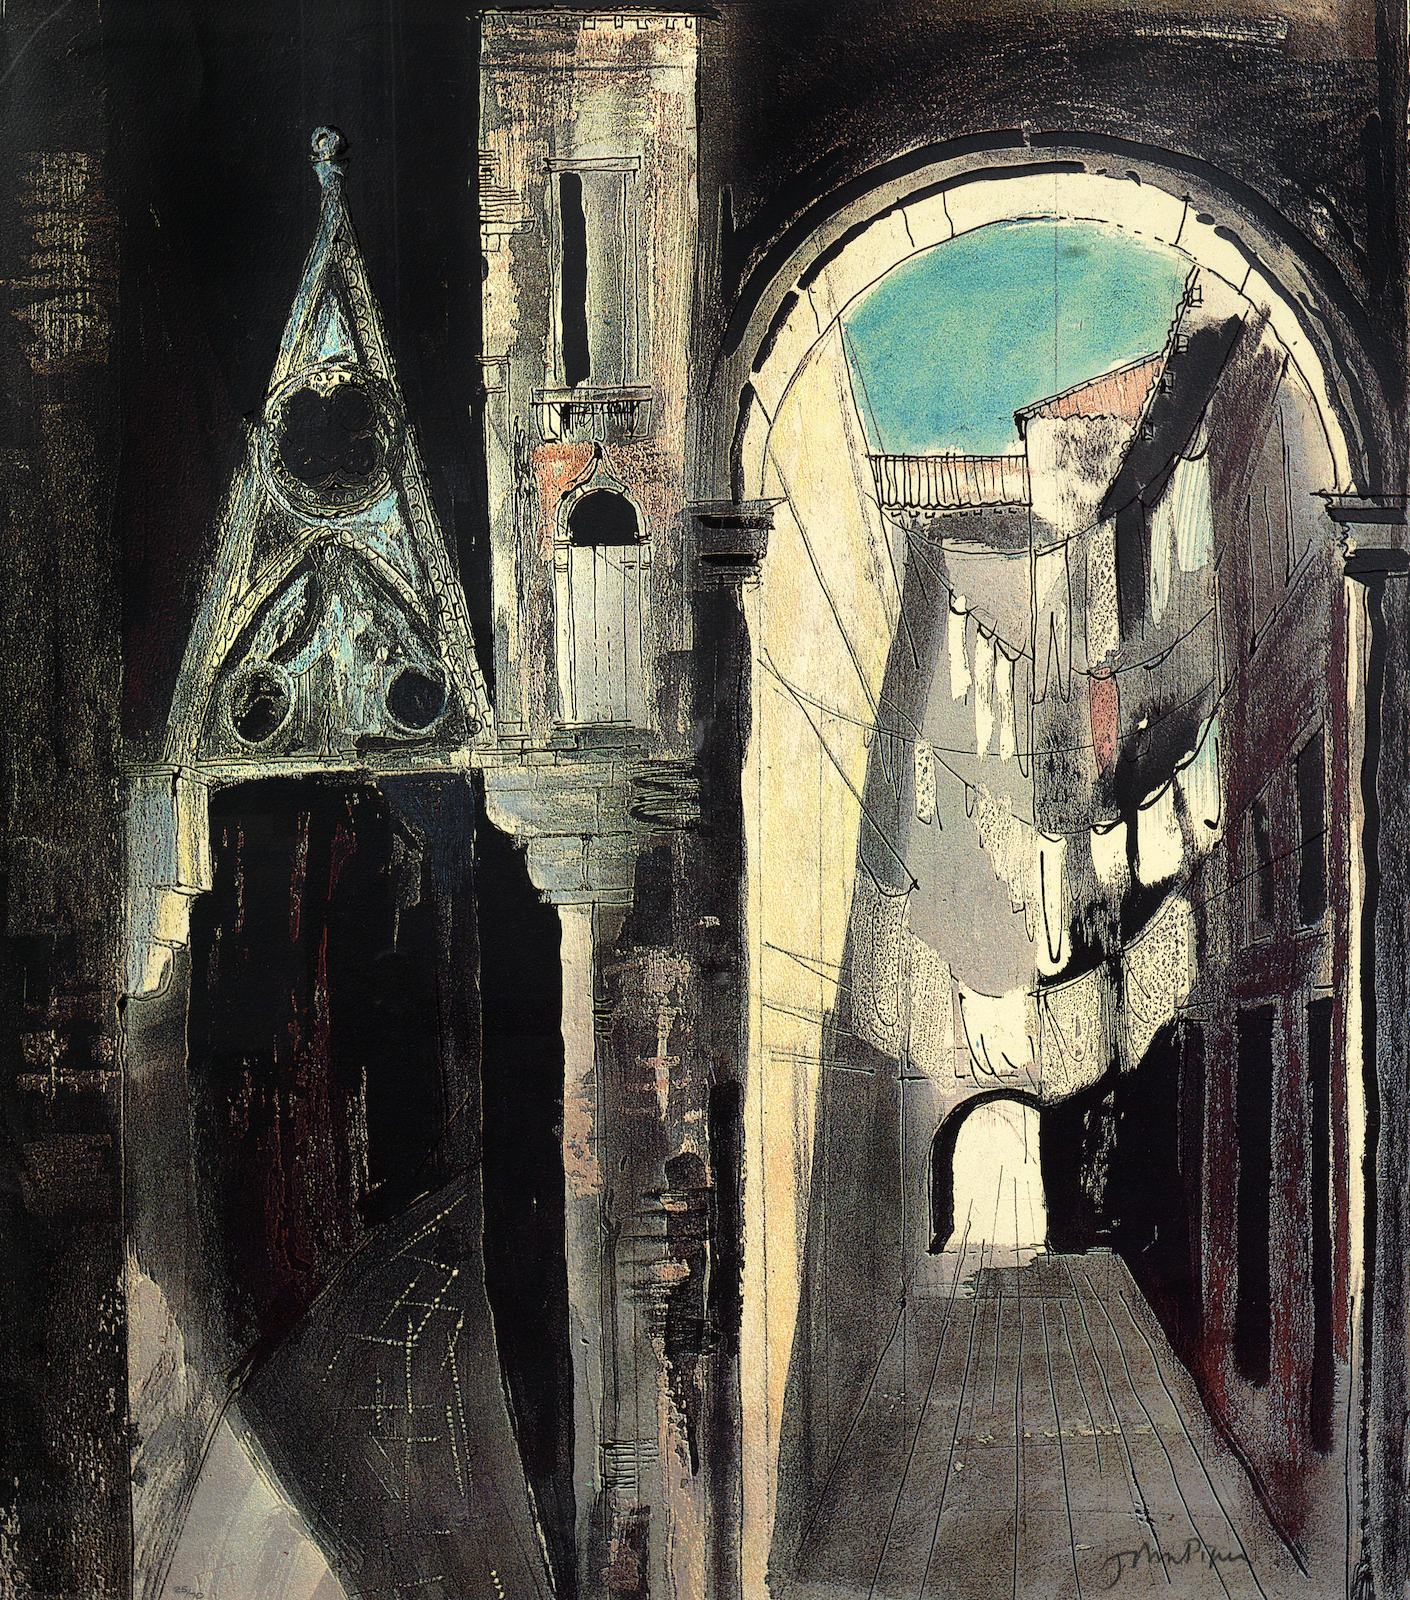 John Piper-Death In Venice III-1973